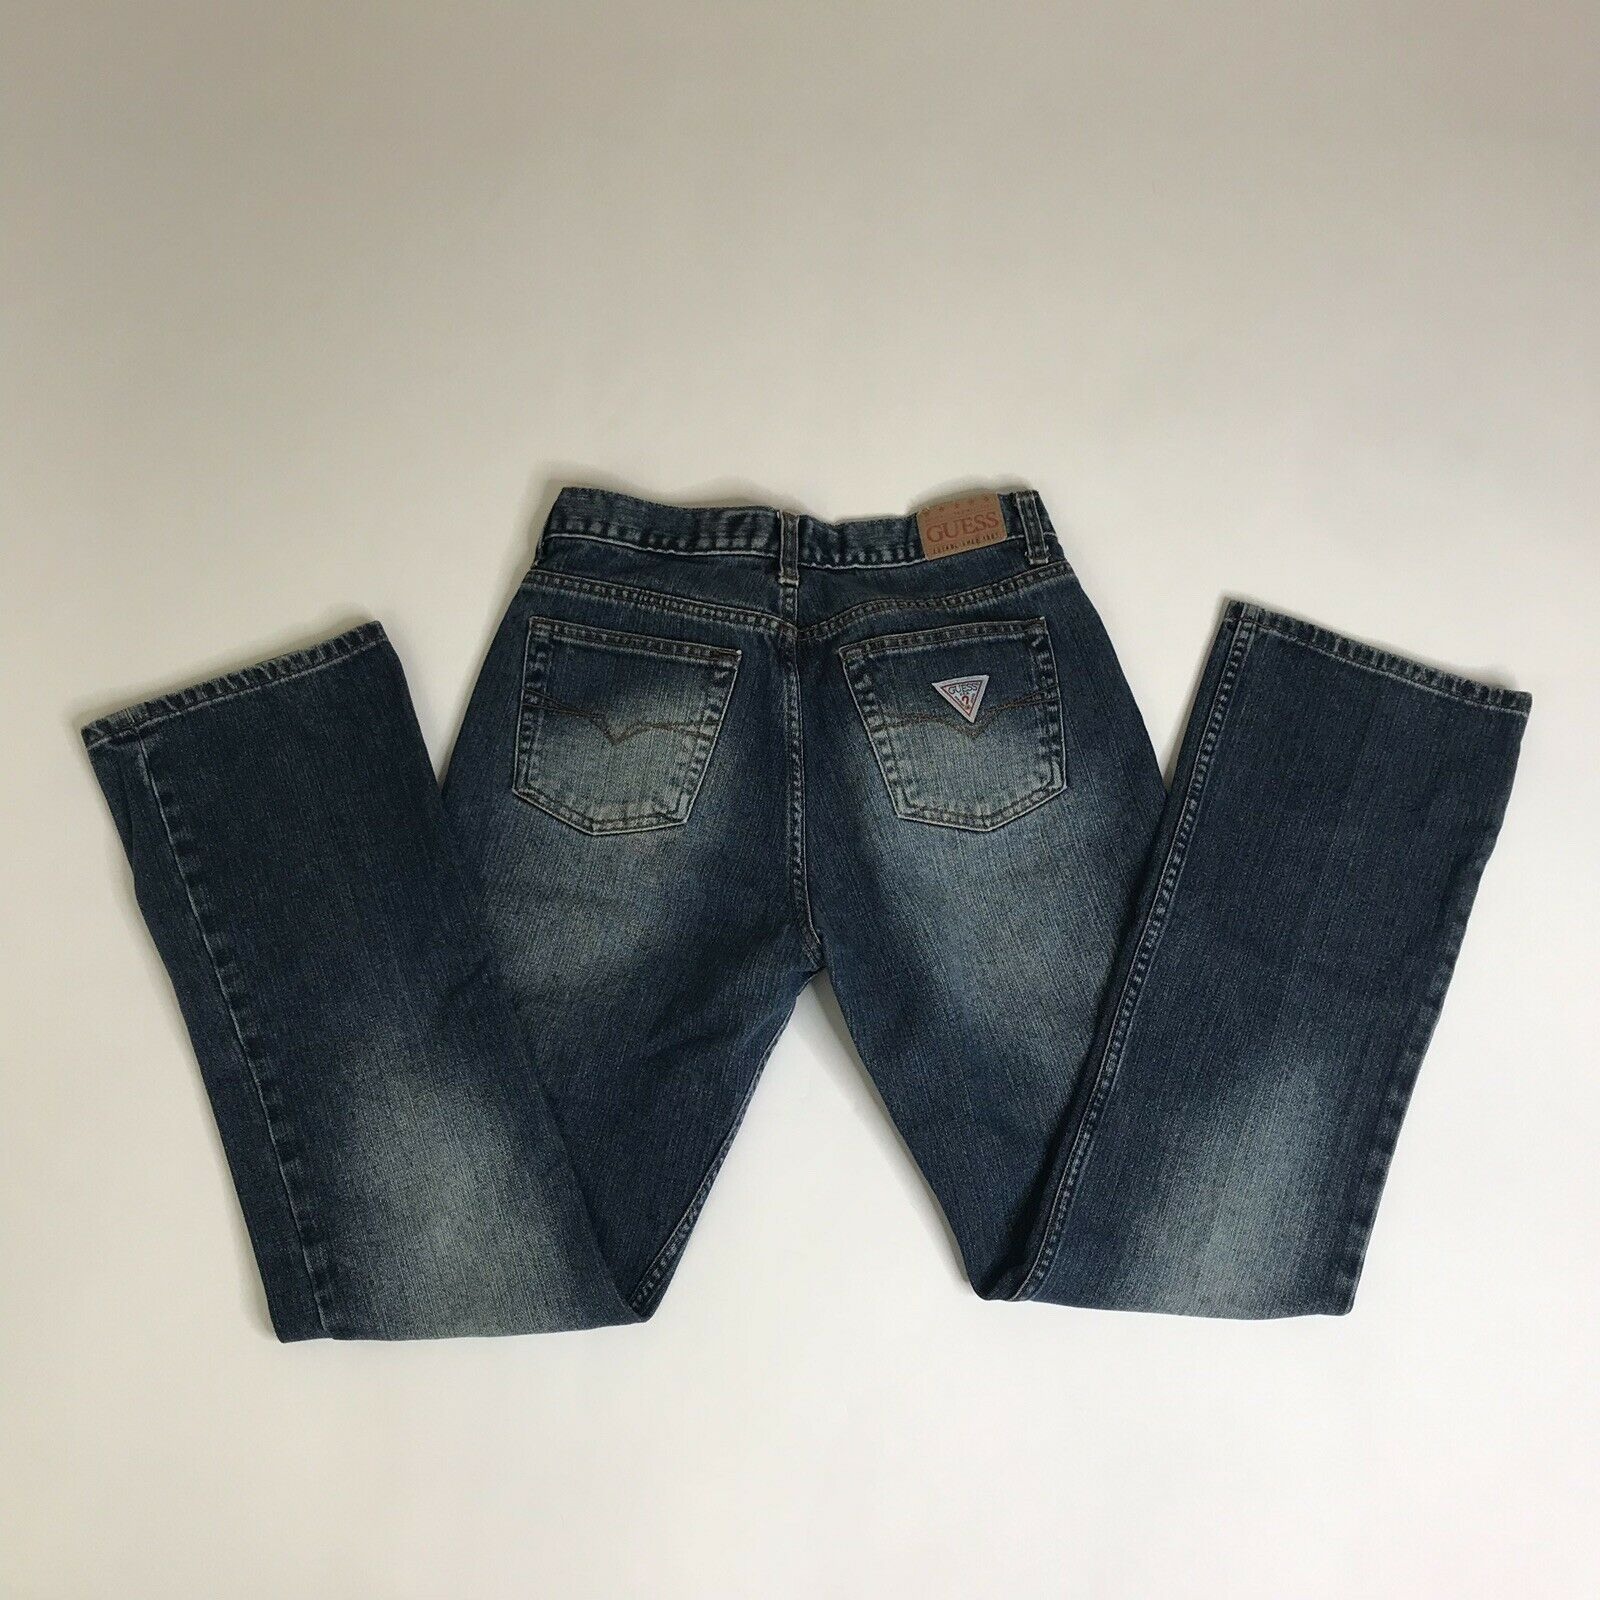 Guess Jeans Women Size 28 Boot Cut